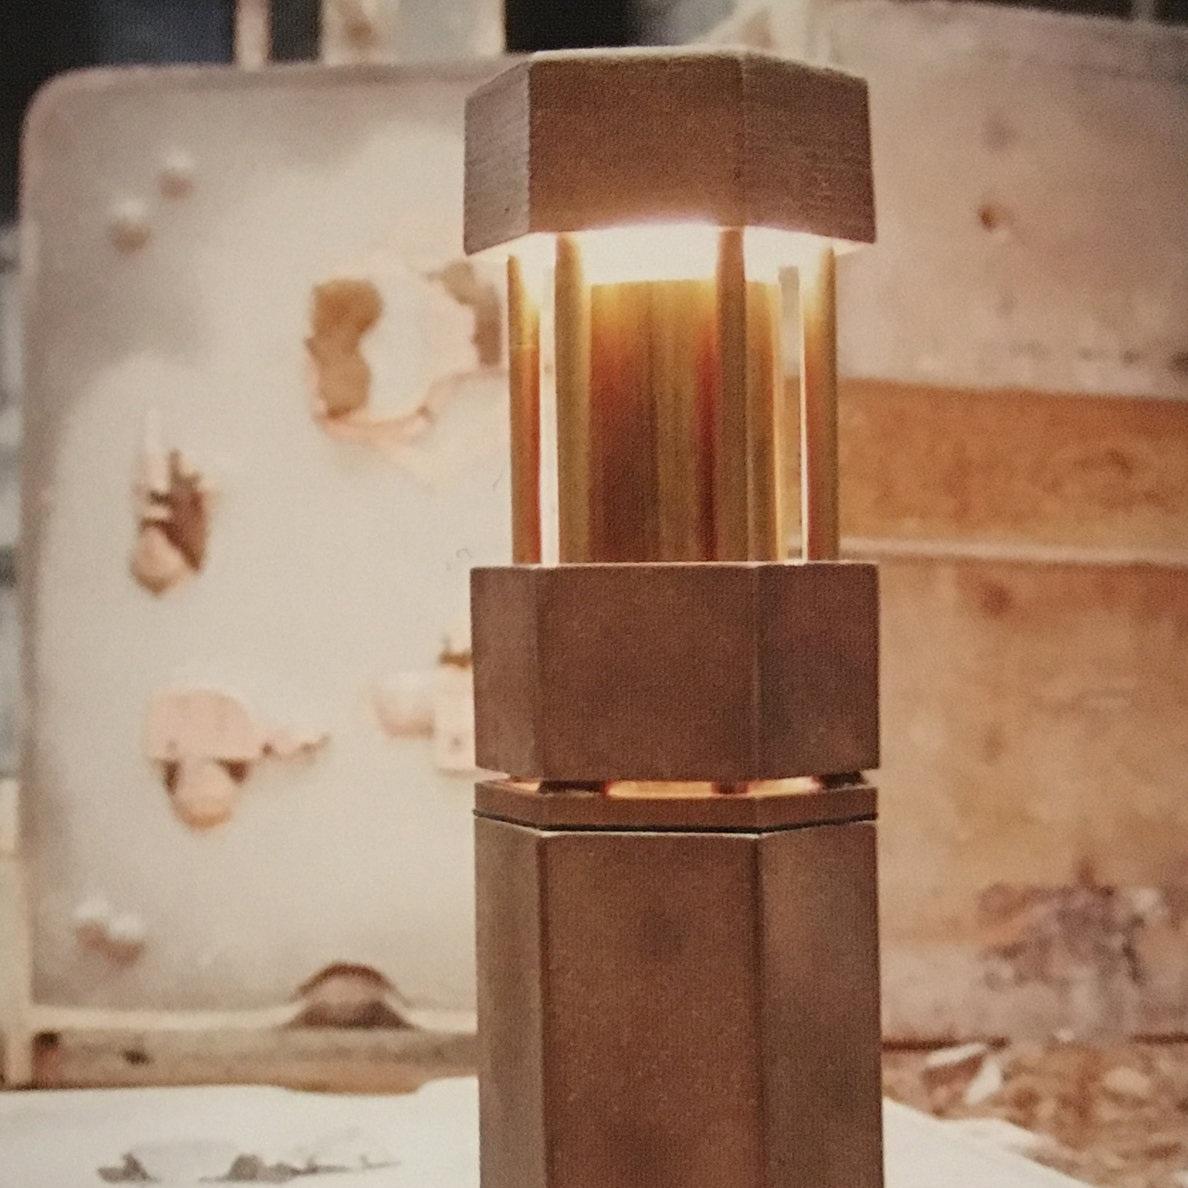 Atelier Antoine Callebaut - Timeless and inspiring works